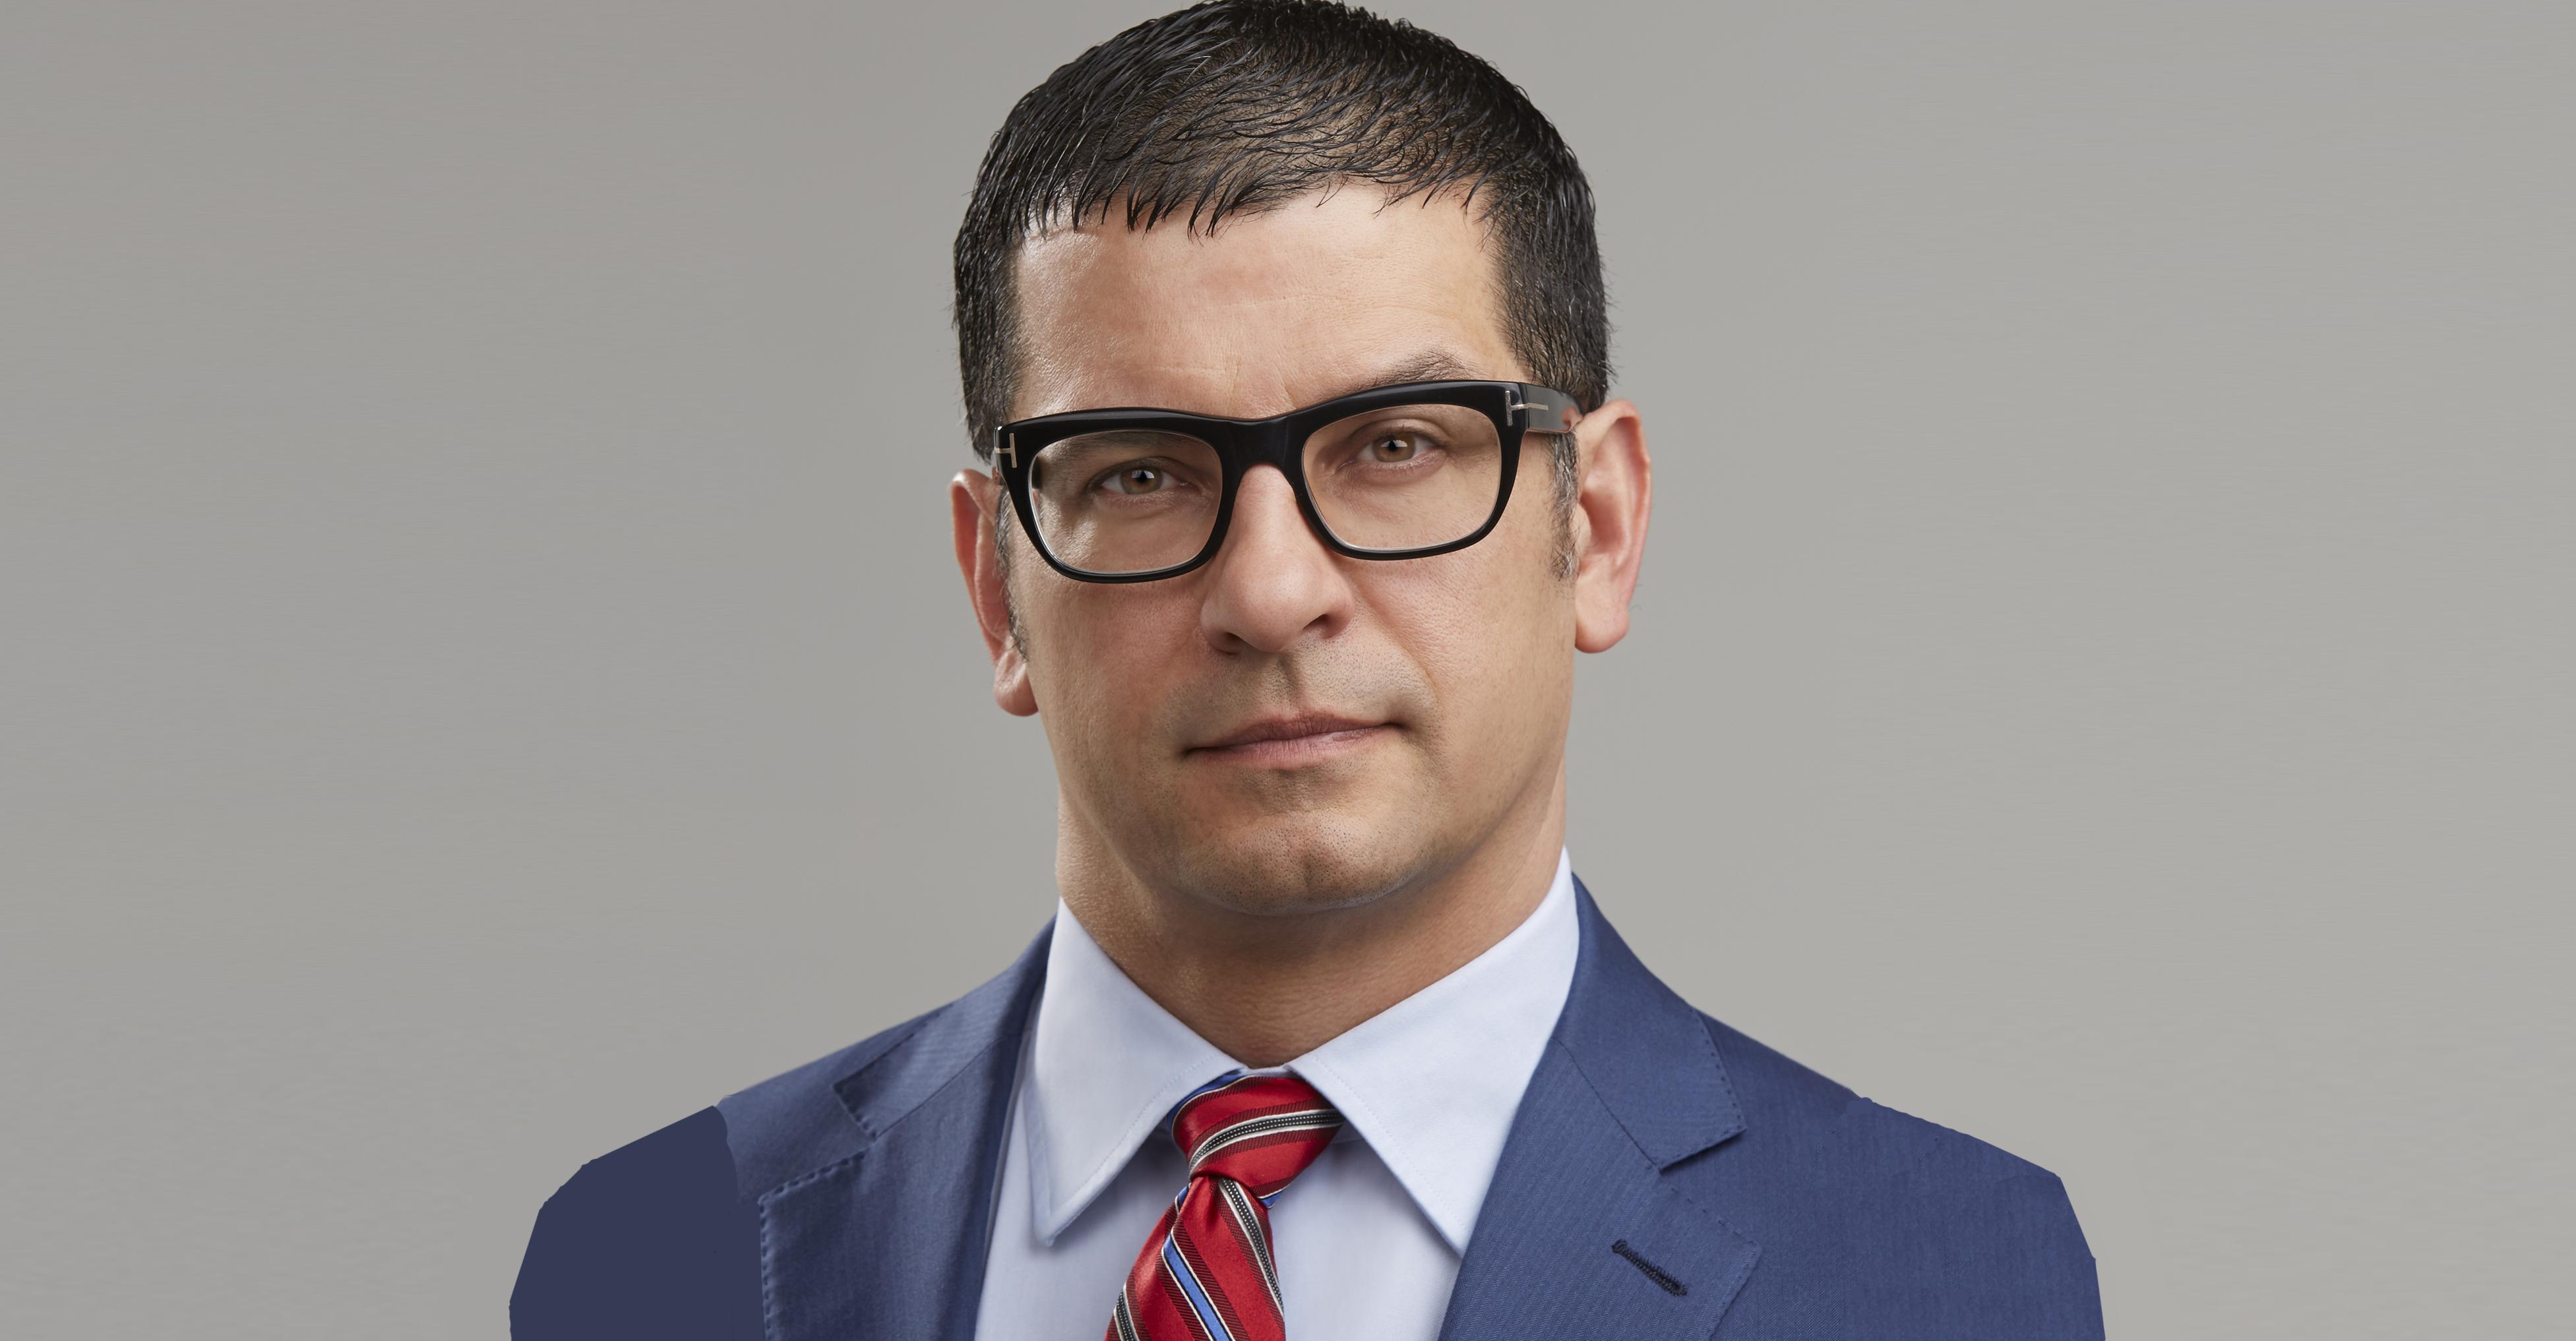 Lawyer Limelight: Brent Goudarzi